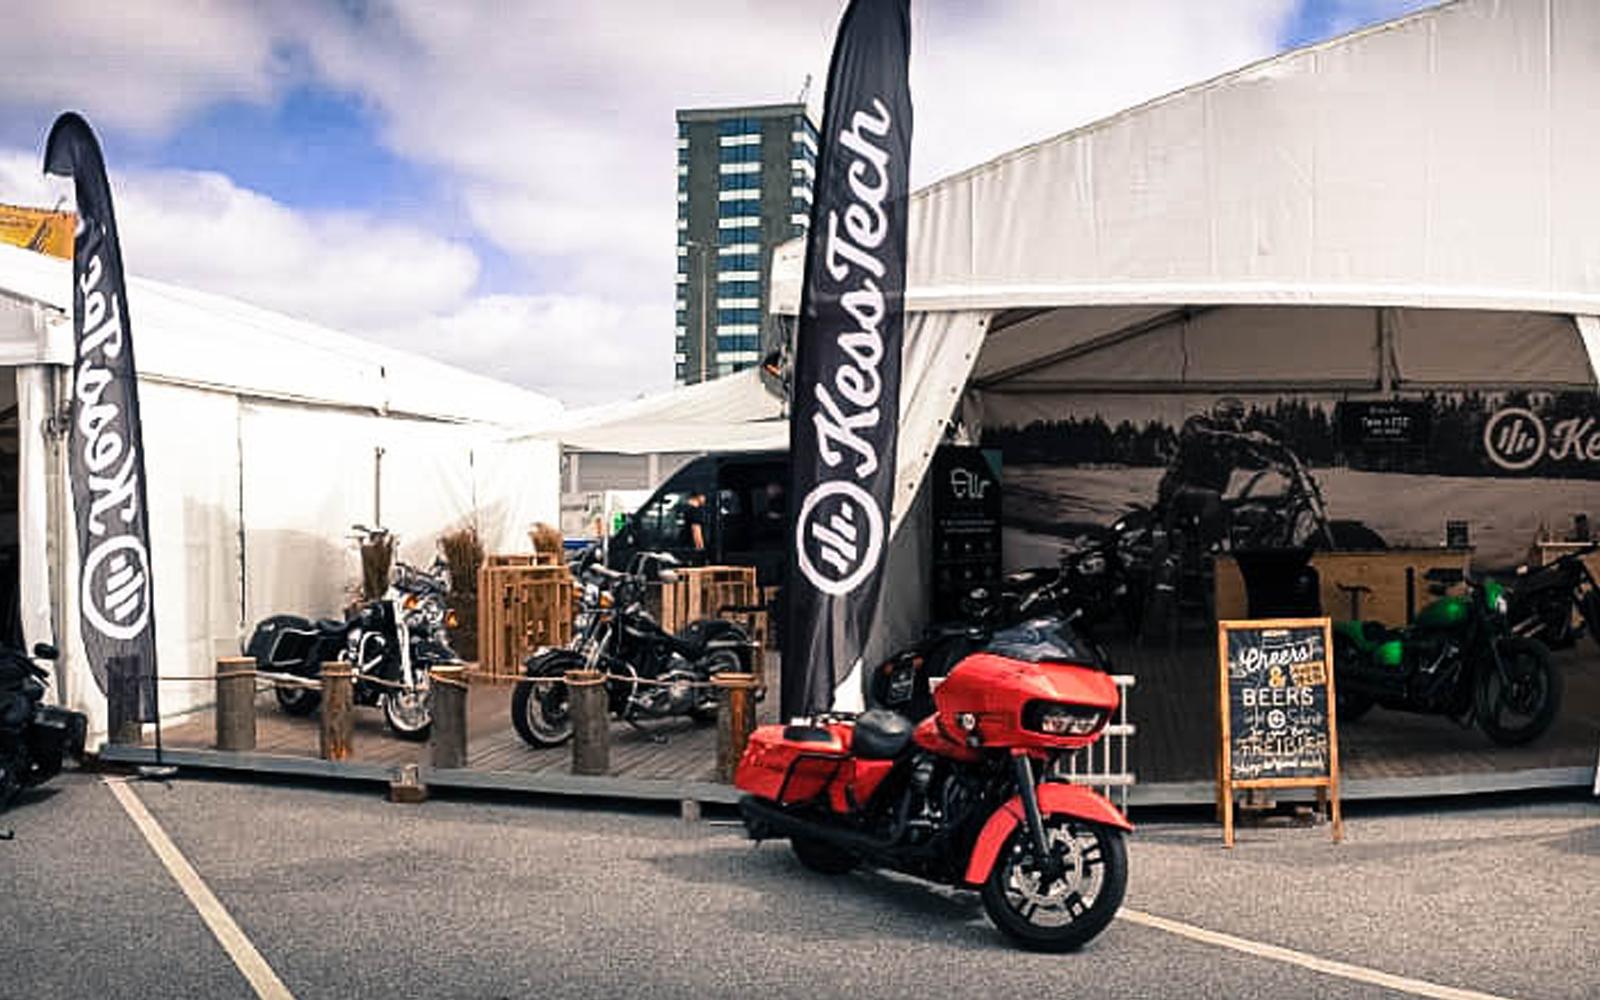 Hamburg Harley Days 2019 | KessTech